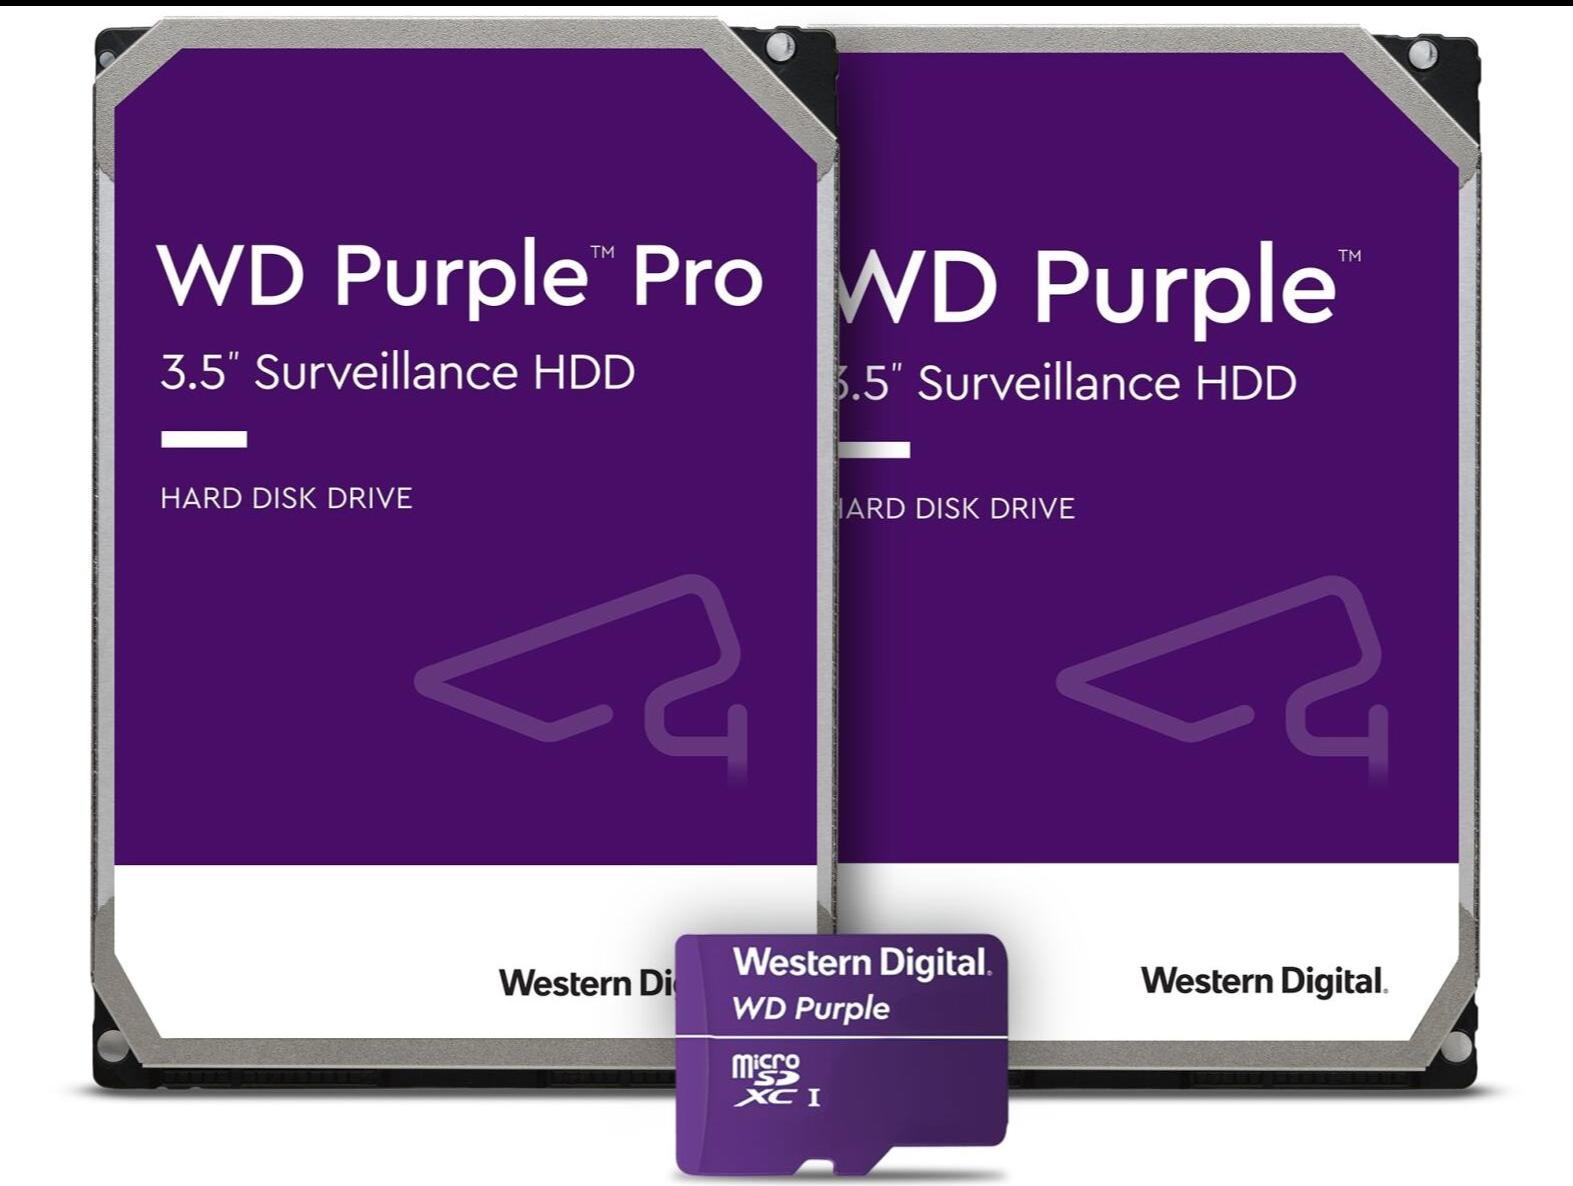 WD Purple Surveillance Pro